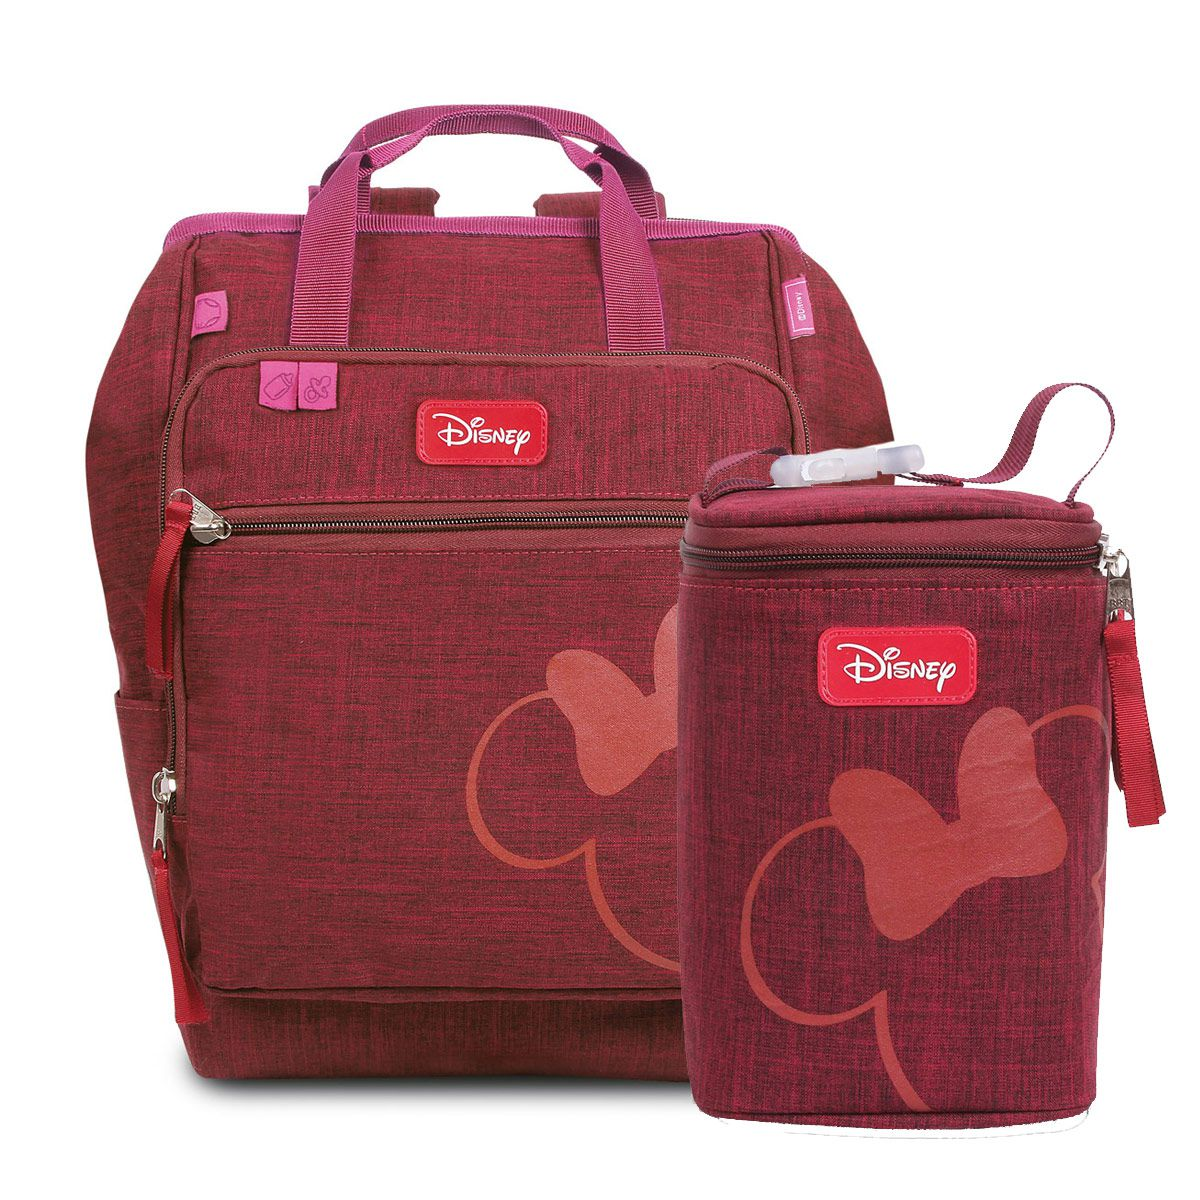 Kit Baby Bag Mochila + Porta Mamadeira Minnie Mouse Vinho c/ Trocador Disney